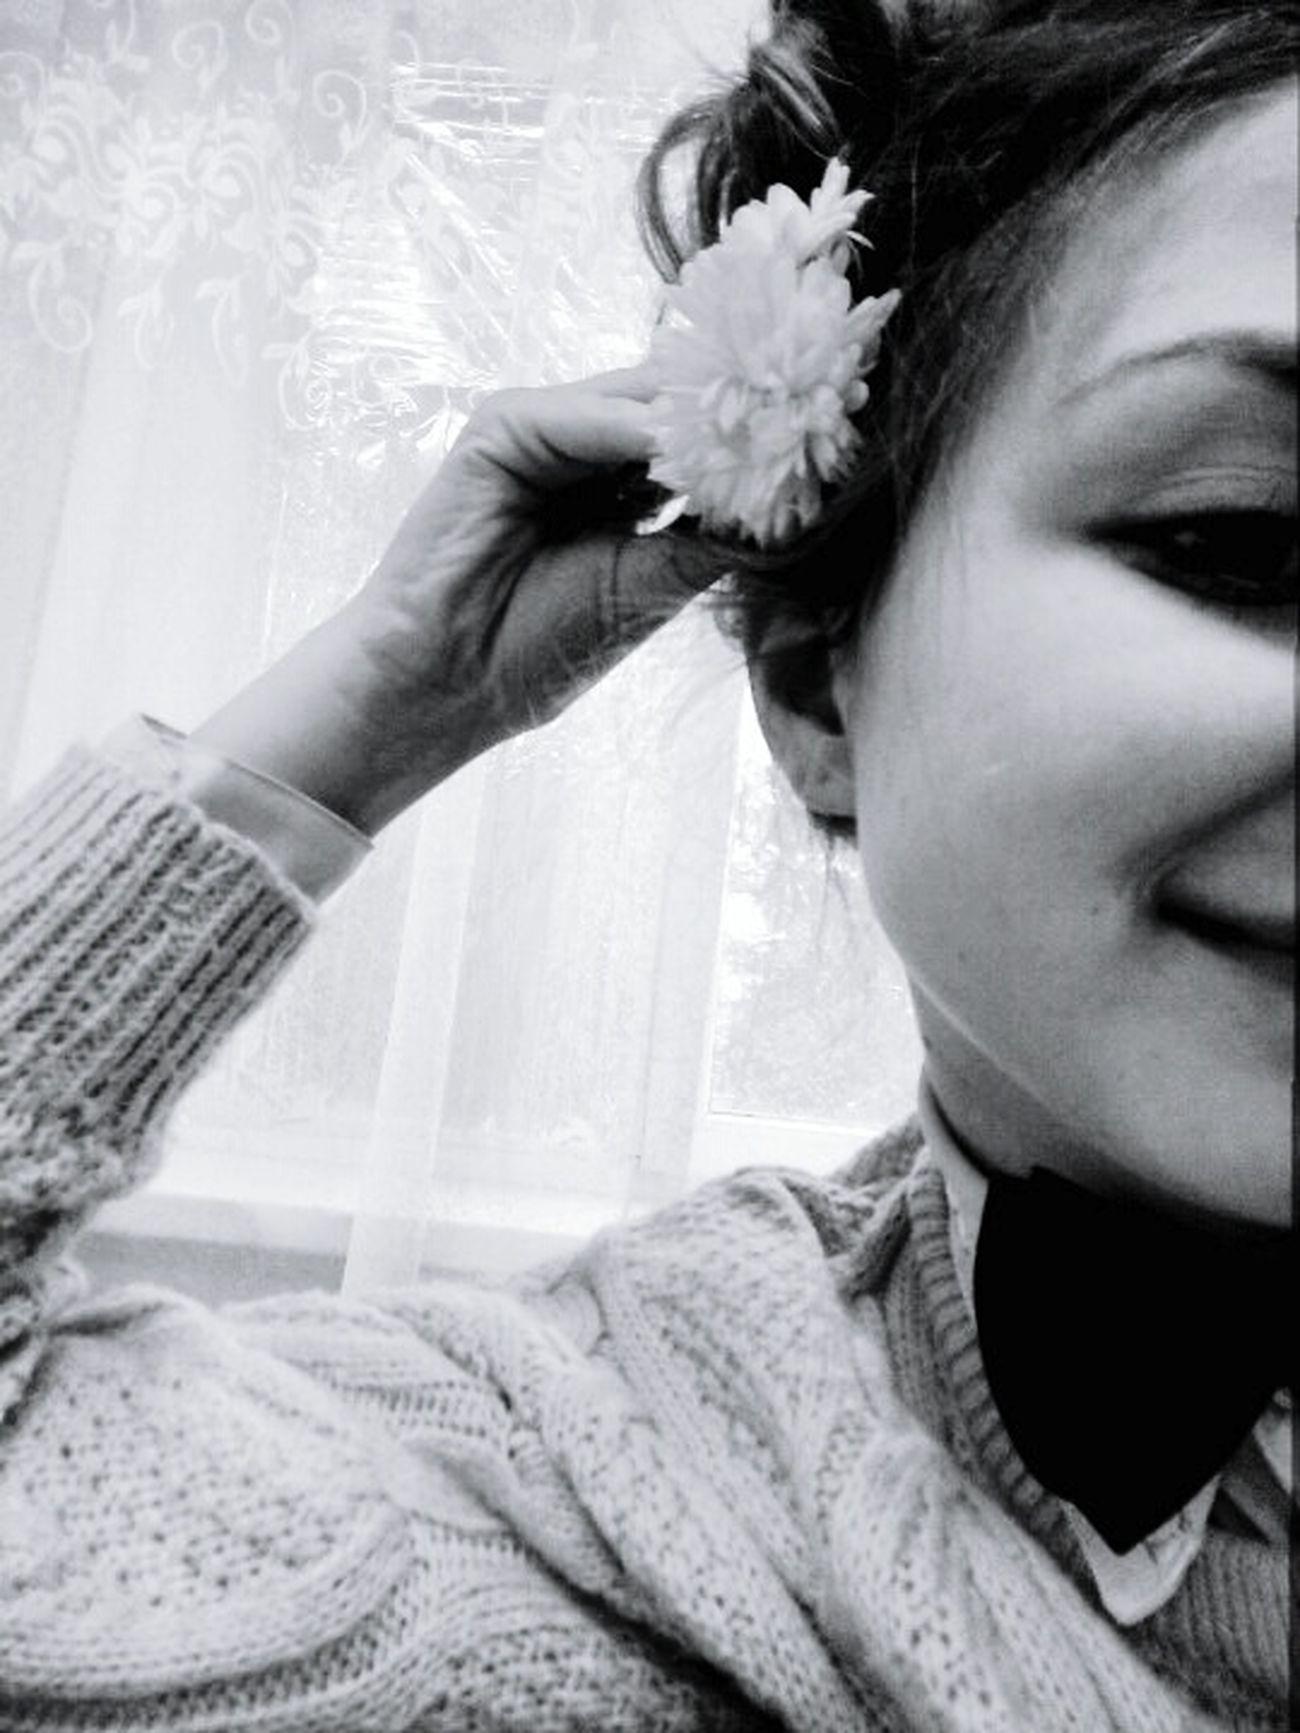 Цветочек🌸 цветок  Face Beautiful милая красивая мое_фото школа😁 Scool Morning Morning хочу весну Hello Desember Goodbye . Flower Close-up One Person Human Face Women Real People Lifestyles Portrait Young Adult Adult